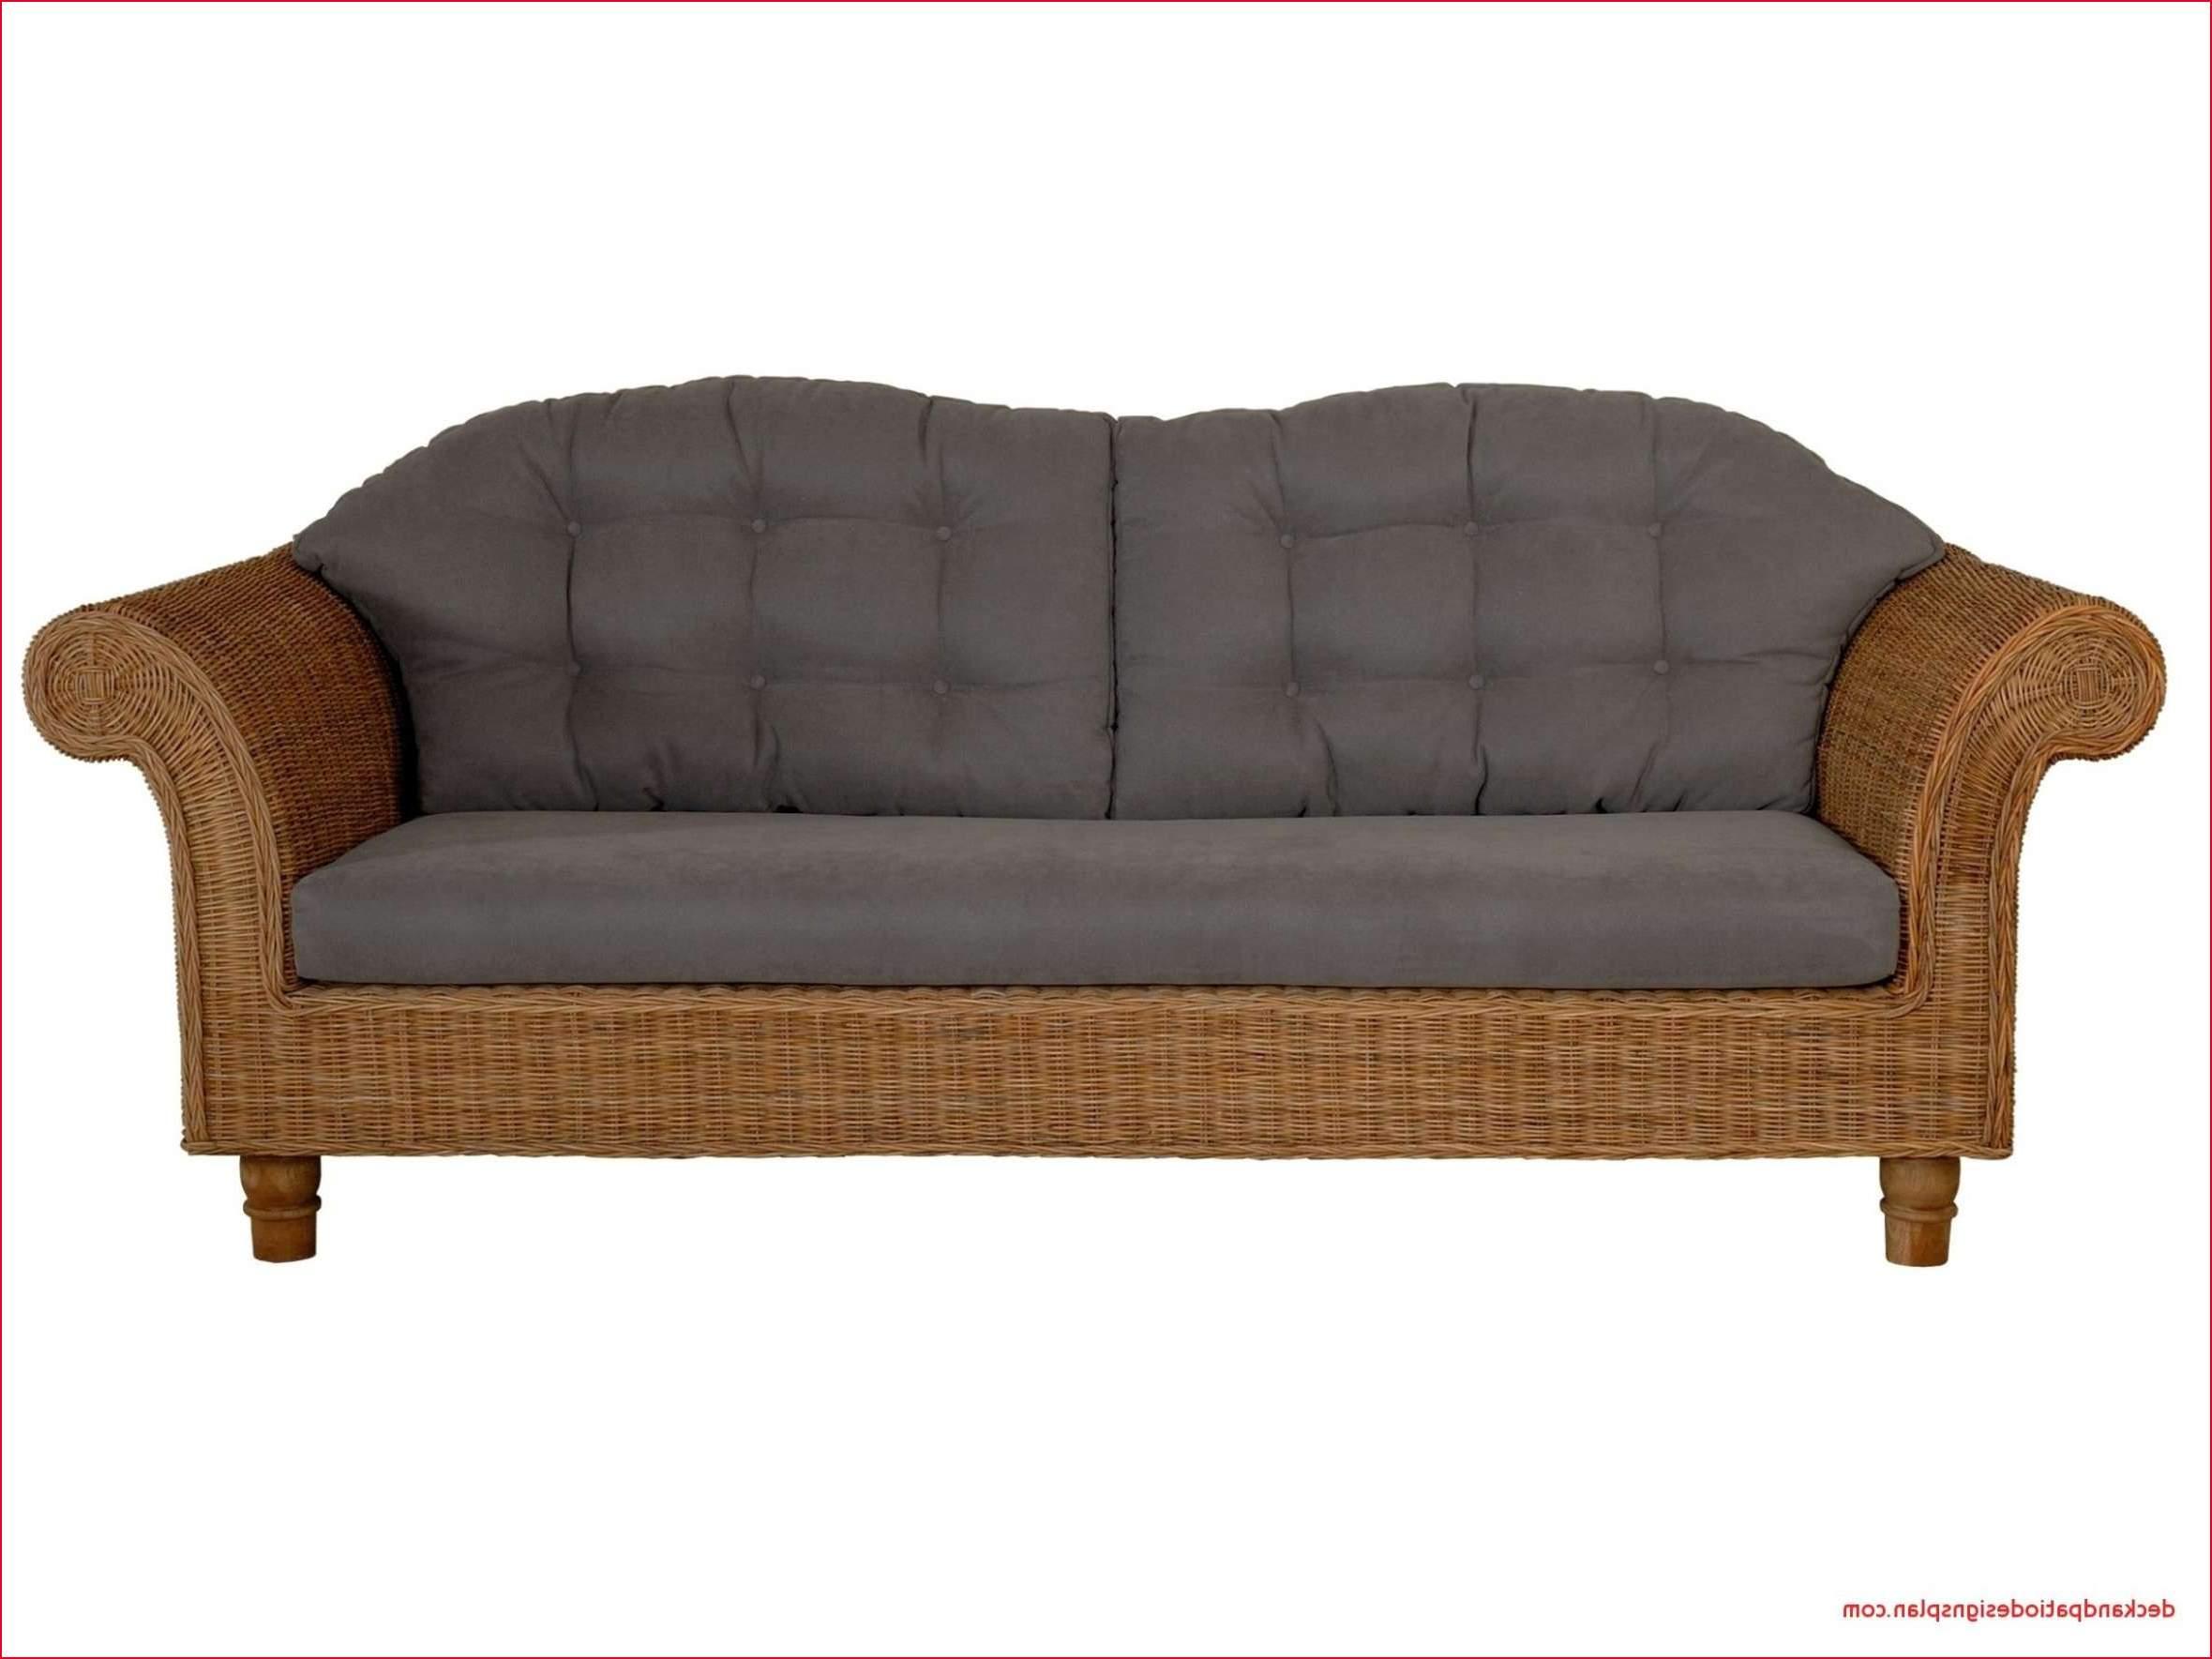 ideen fur sofa sessel bilder von sofa dekoration pxpzwsva of garten lounge sessel